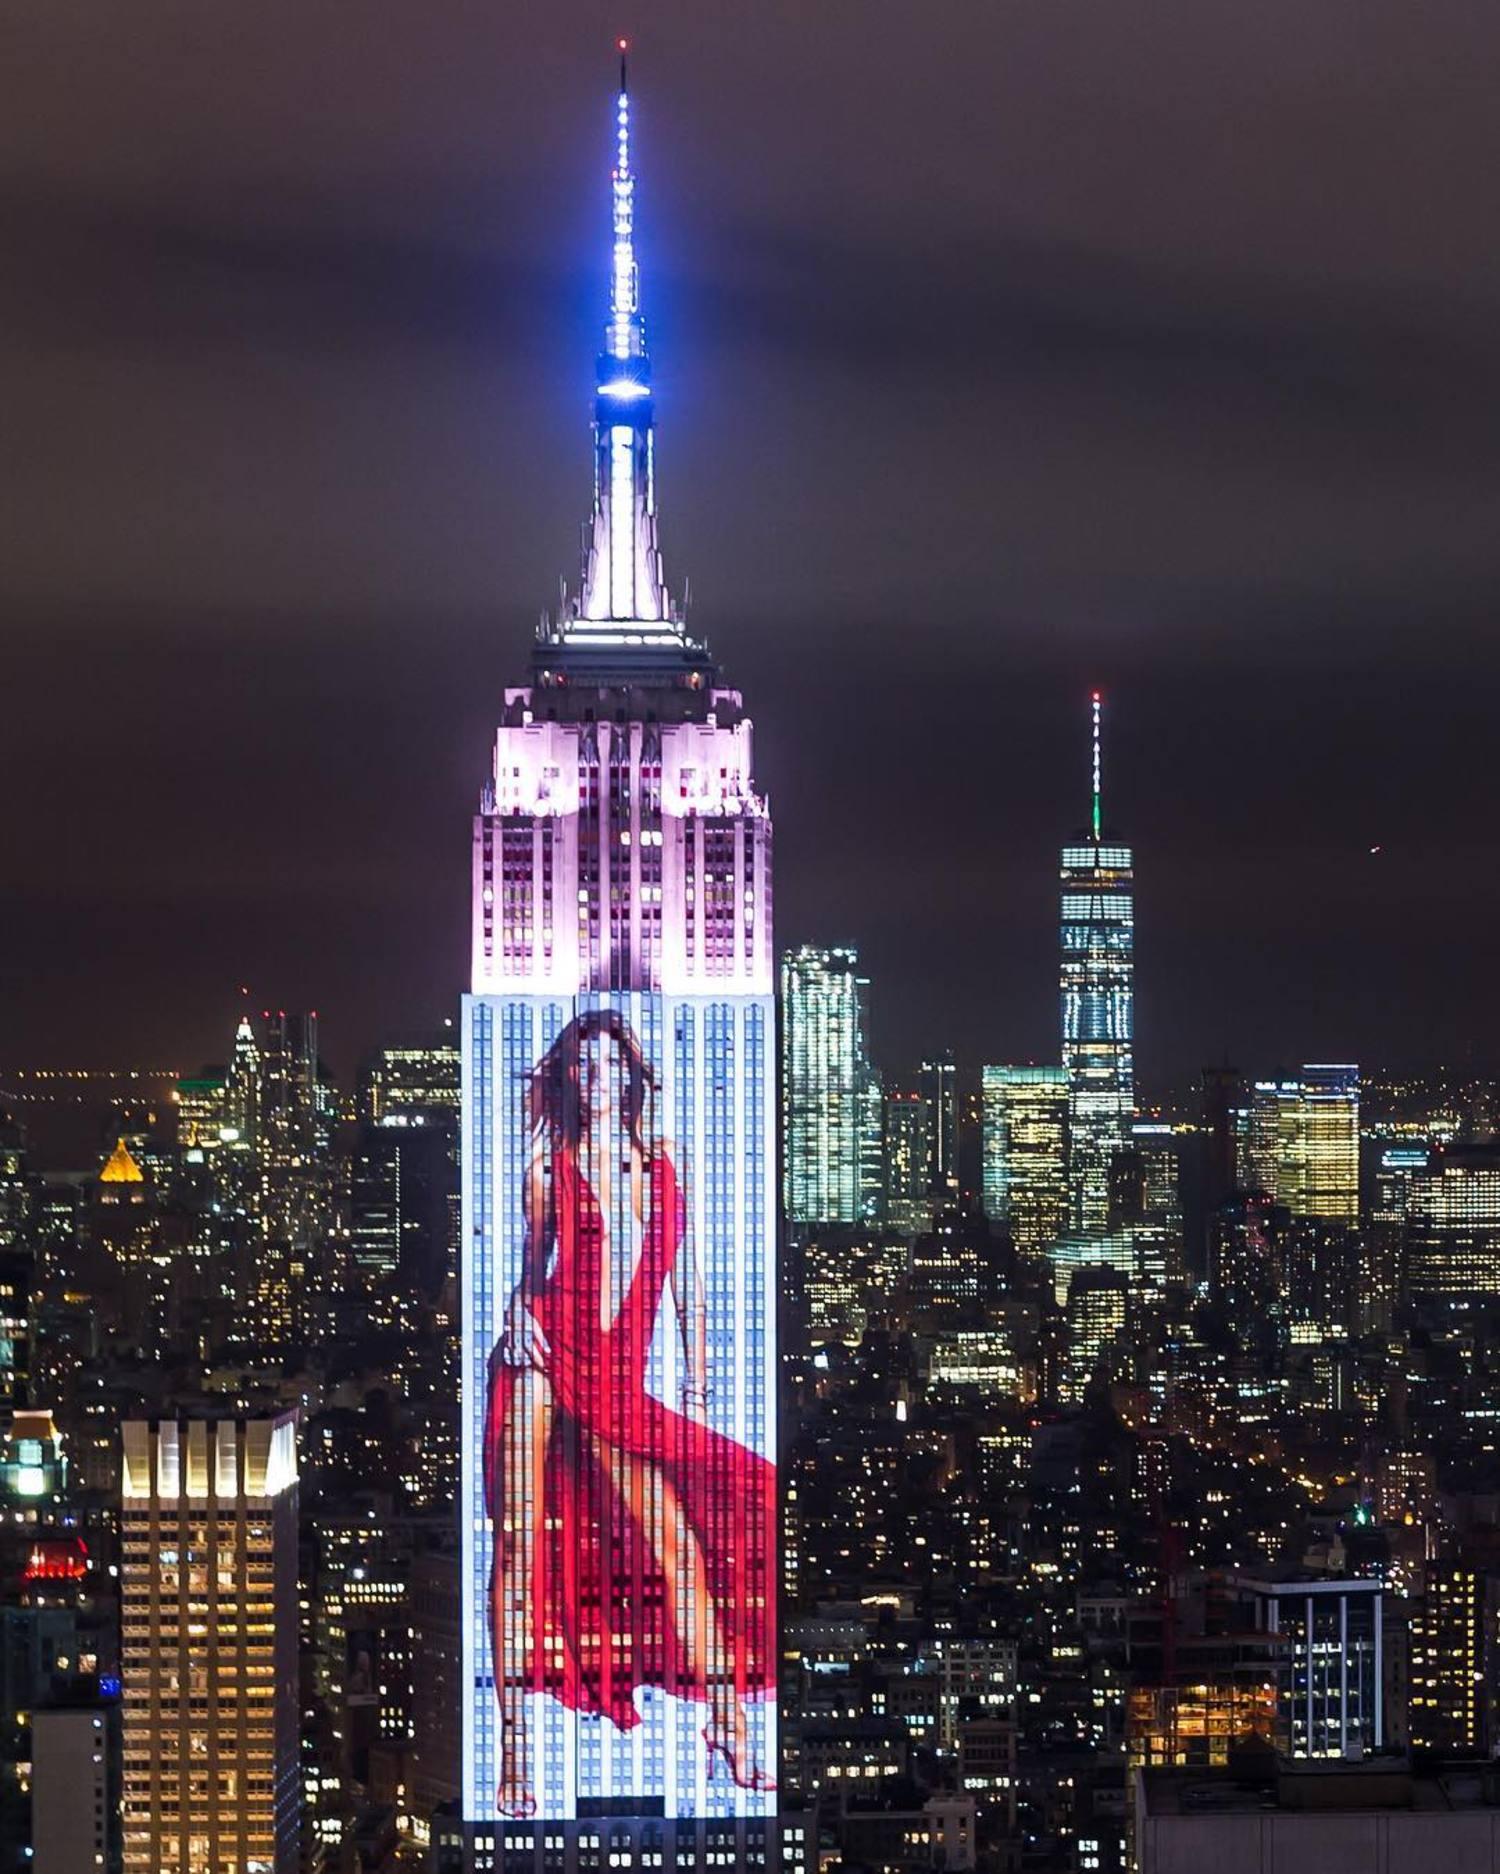 @patrickdemarchelier 's cover of @gisele taking over the entire @empirestatebldg for @harpersbazaarus's 150th anniversary. #bazaar150 #bazaar150xtiffany @tiffanyandco  #NY #NewYork #NYC #NewYorkCity #Manhattan #ThisIsNewYorkCity #WildNewYork #WhyILoveNewYork #USAPrimeShot #_NYC #nycprimeshot #ig_nycity #made_in_NY #nbc4ny #storm #cnnireport #topnewyorkphoto #what_I_saw_in_NYC  #instagoodmyphoto #seeyourcity #newyork_instagram #newyorklike #thenewyorklifeinc #ilove_newyo @newyork_instagram #rsa_streetview_ #timeoutnewyork